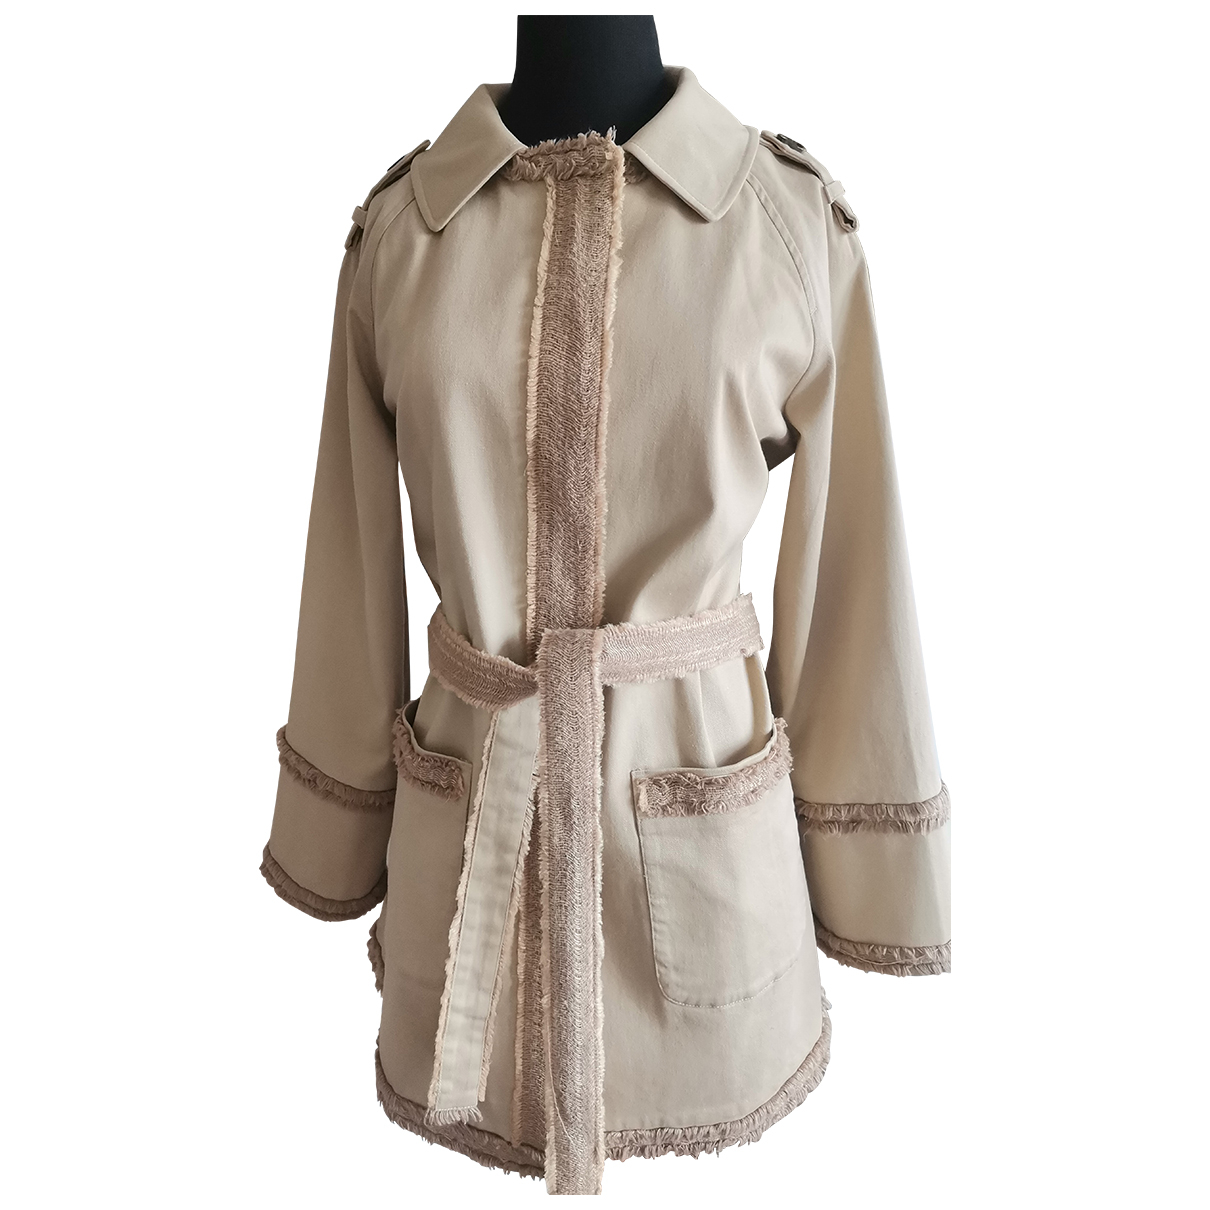 D&g N Beige Cotton jacket for Women 38 FR